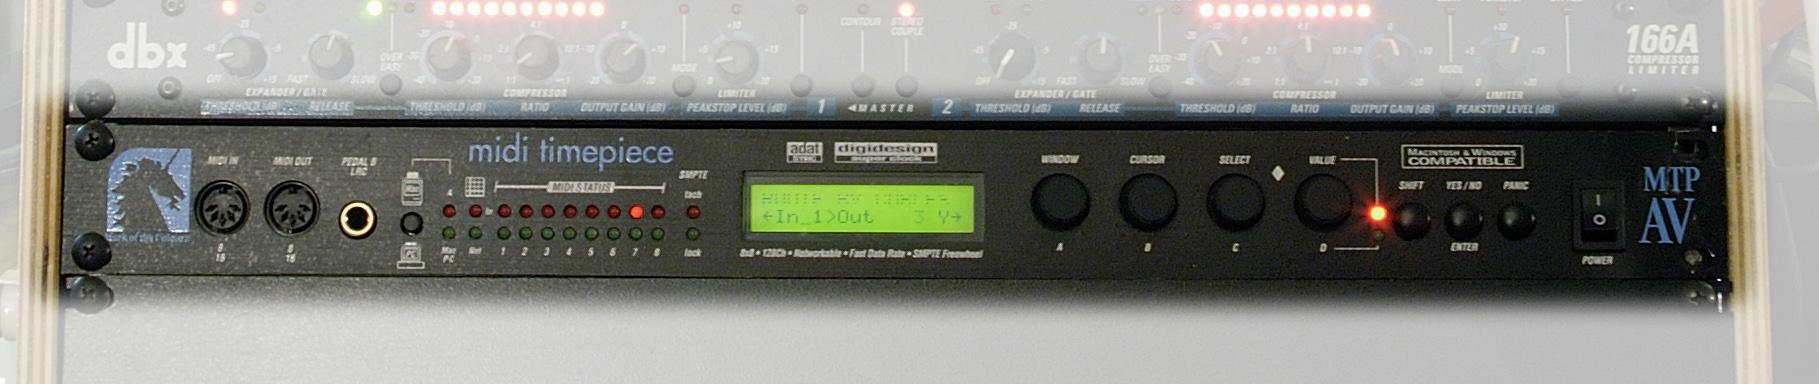 midi timepiece av 1996 mtp av 8x8 midi interface rh oldschooldaw com Midi Timepiece AV Manual MOTU Digital Timepiece